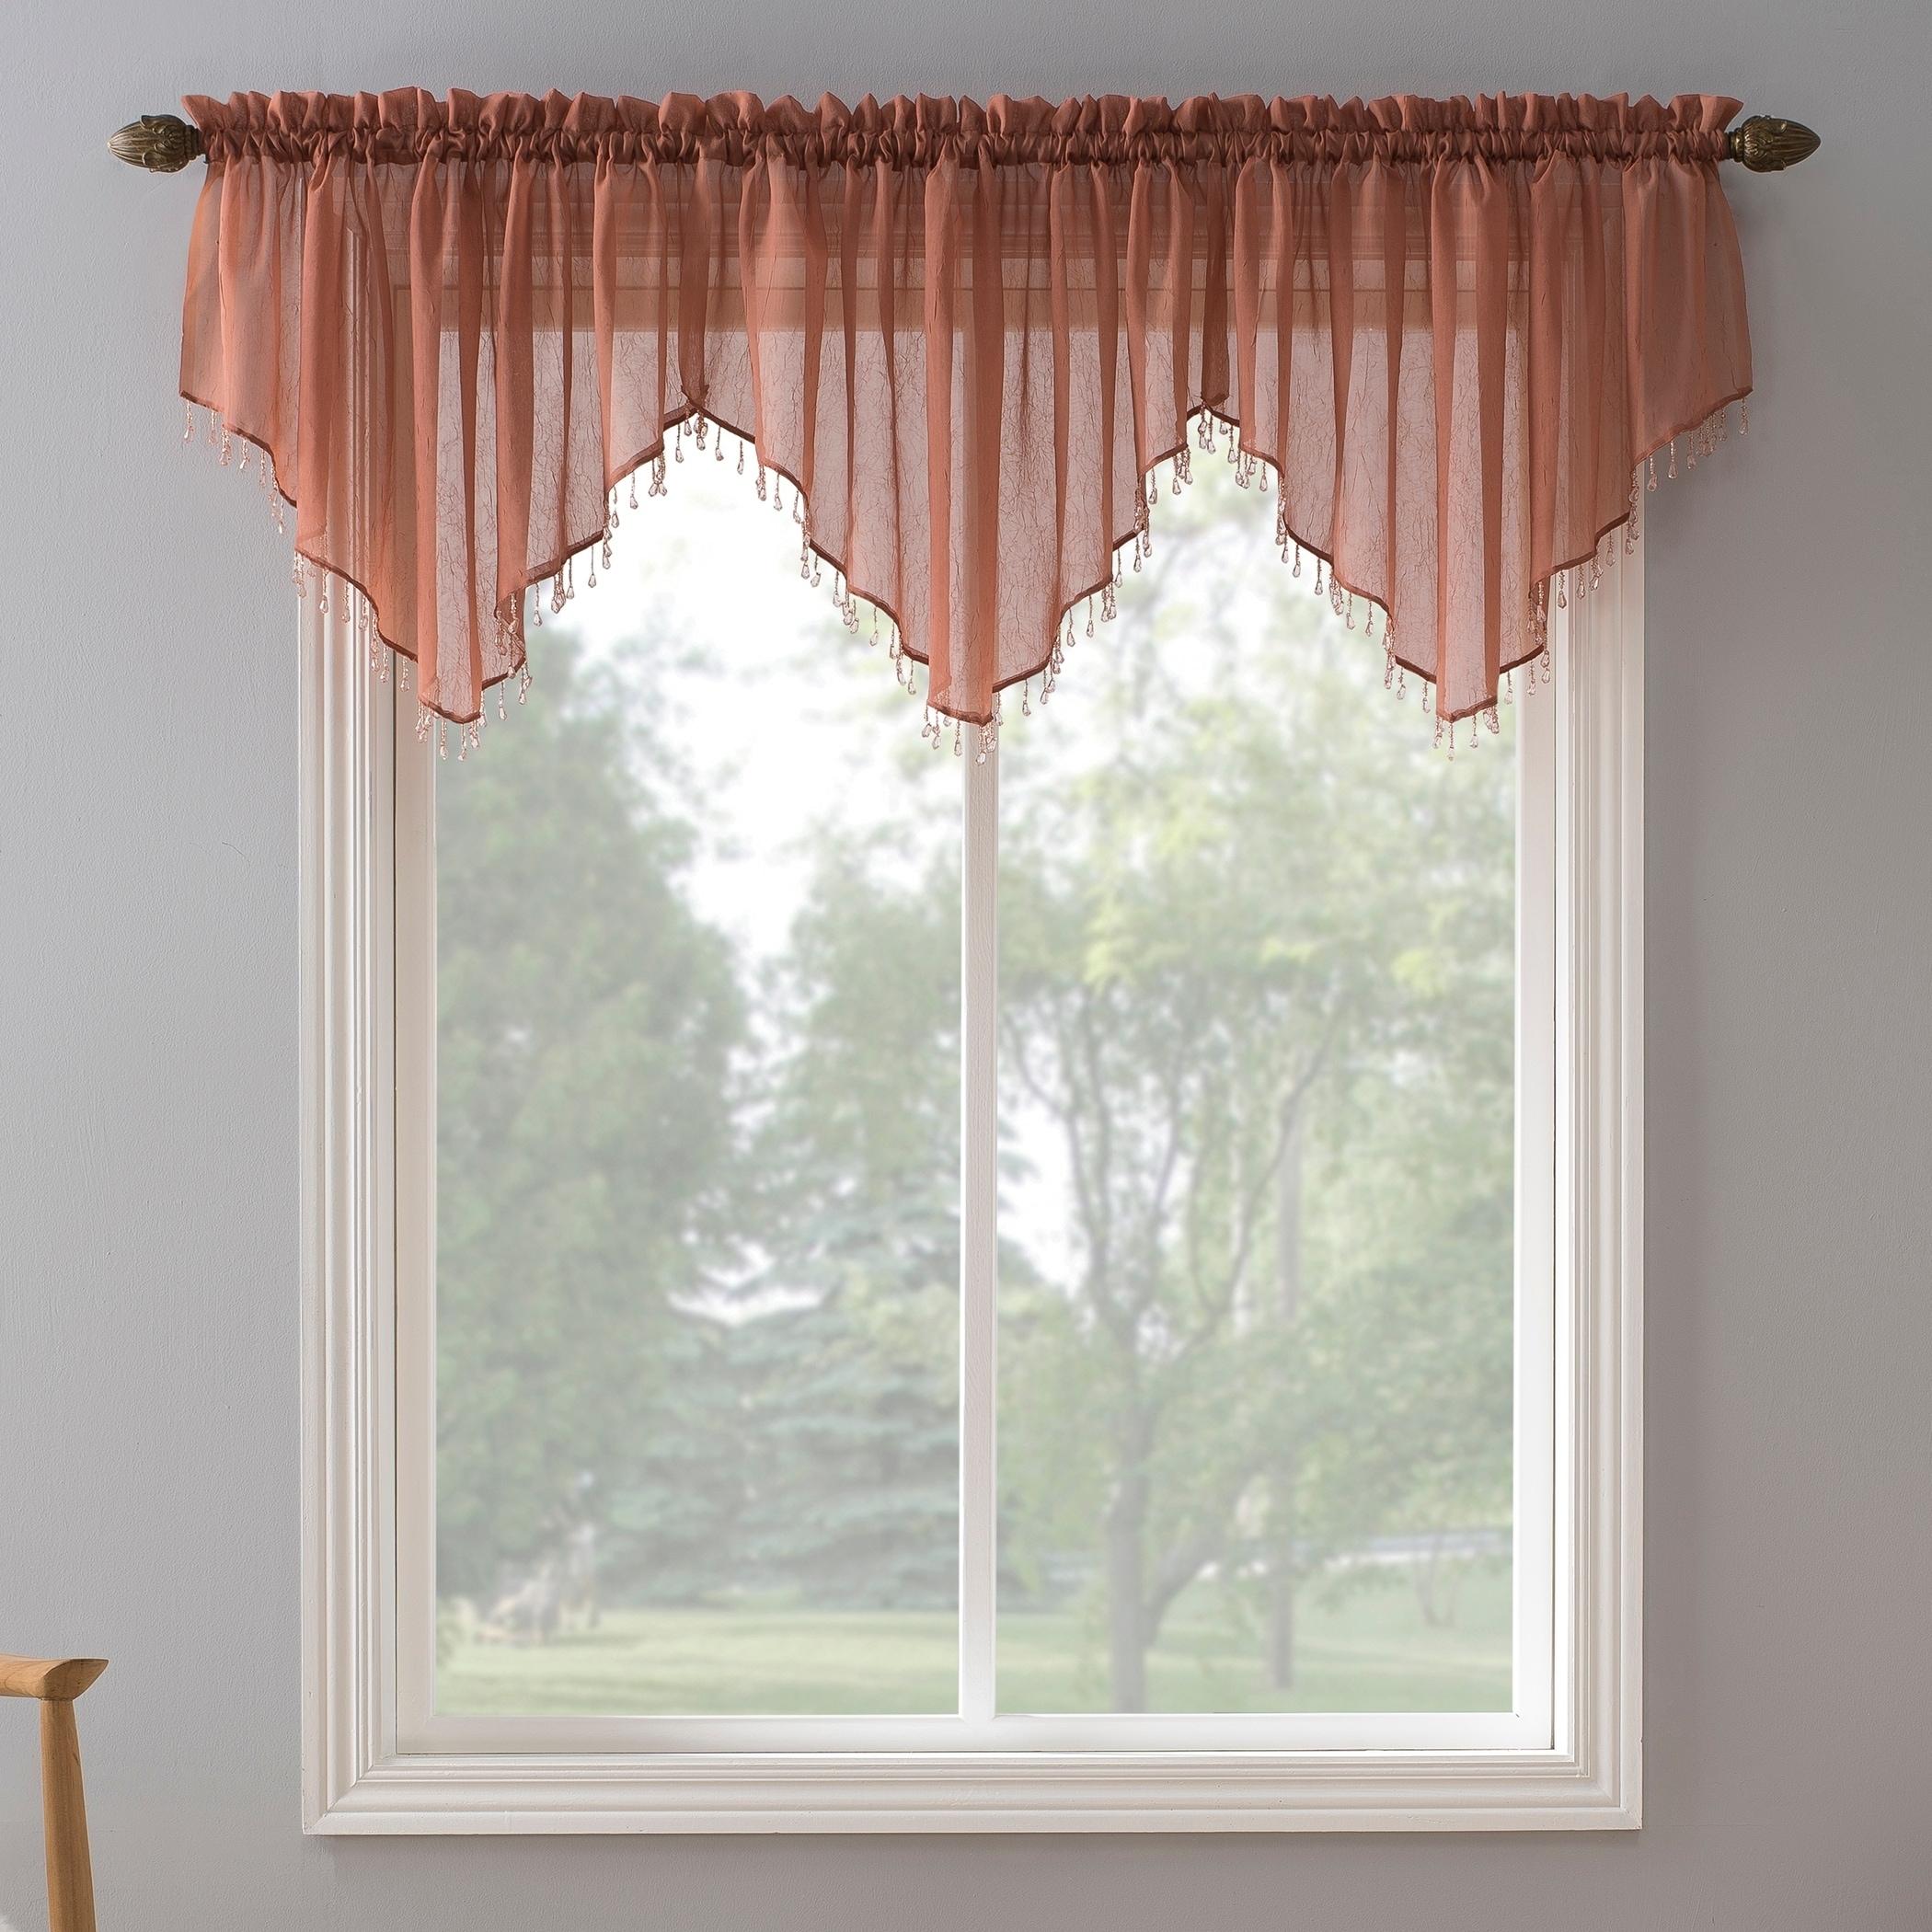 No 918 Erica Sheer Crush Voile Single Ascot Curtain Valance